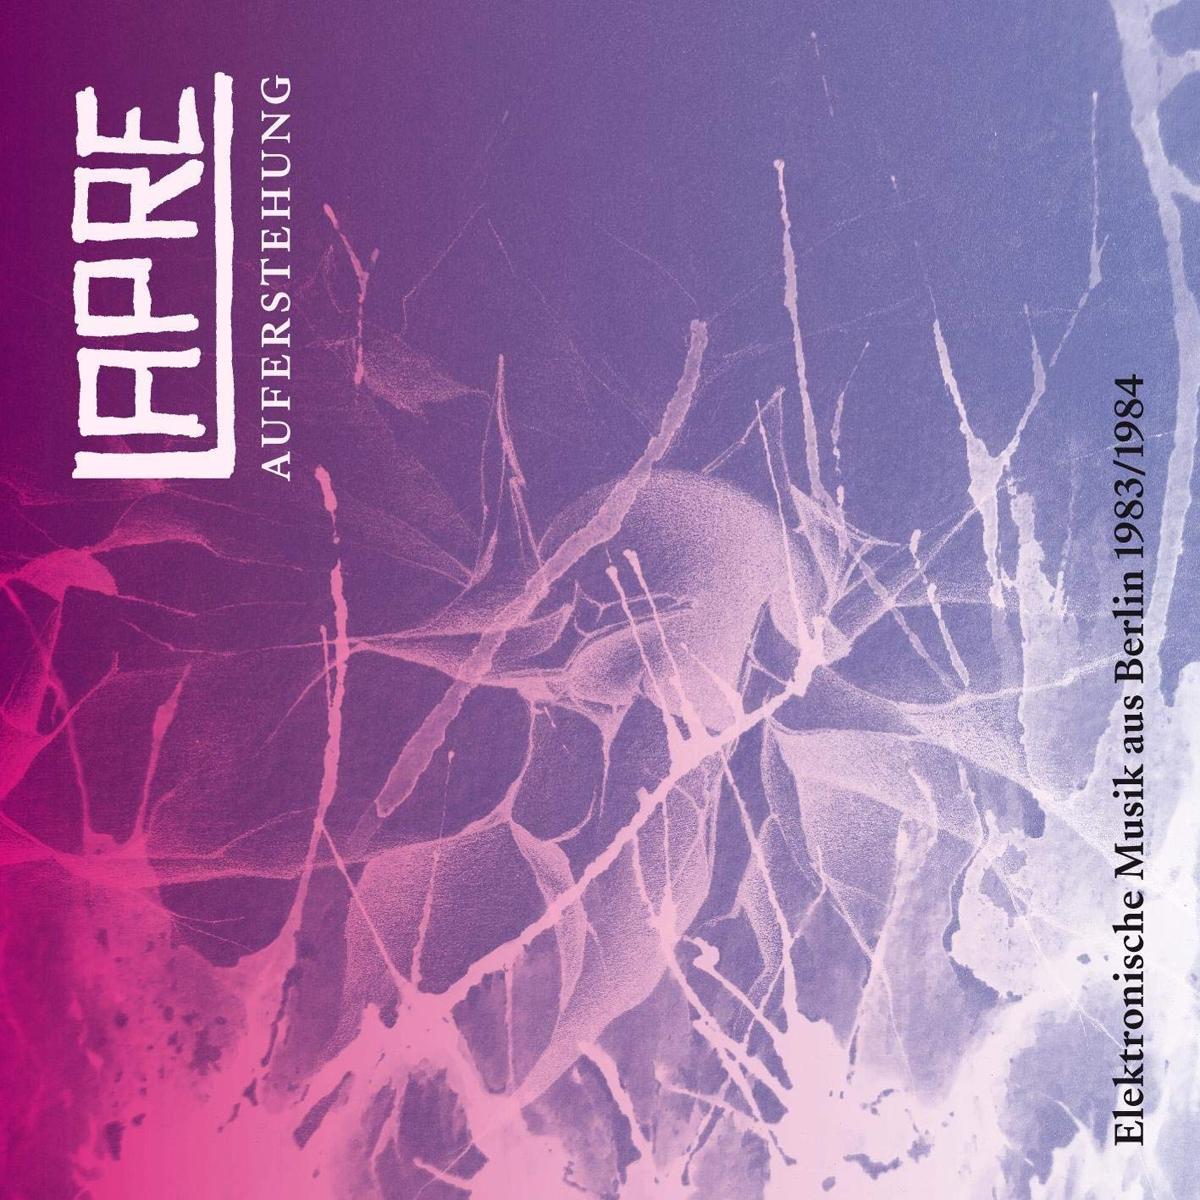 Lapre Lapre. Auferstehung. Elektronische Musik Aus Berlin 1983-1984 (LP) akademie fur alte musik berlin akademie fur alte musik berlin music for the berlin court